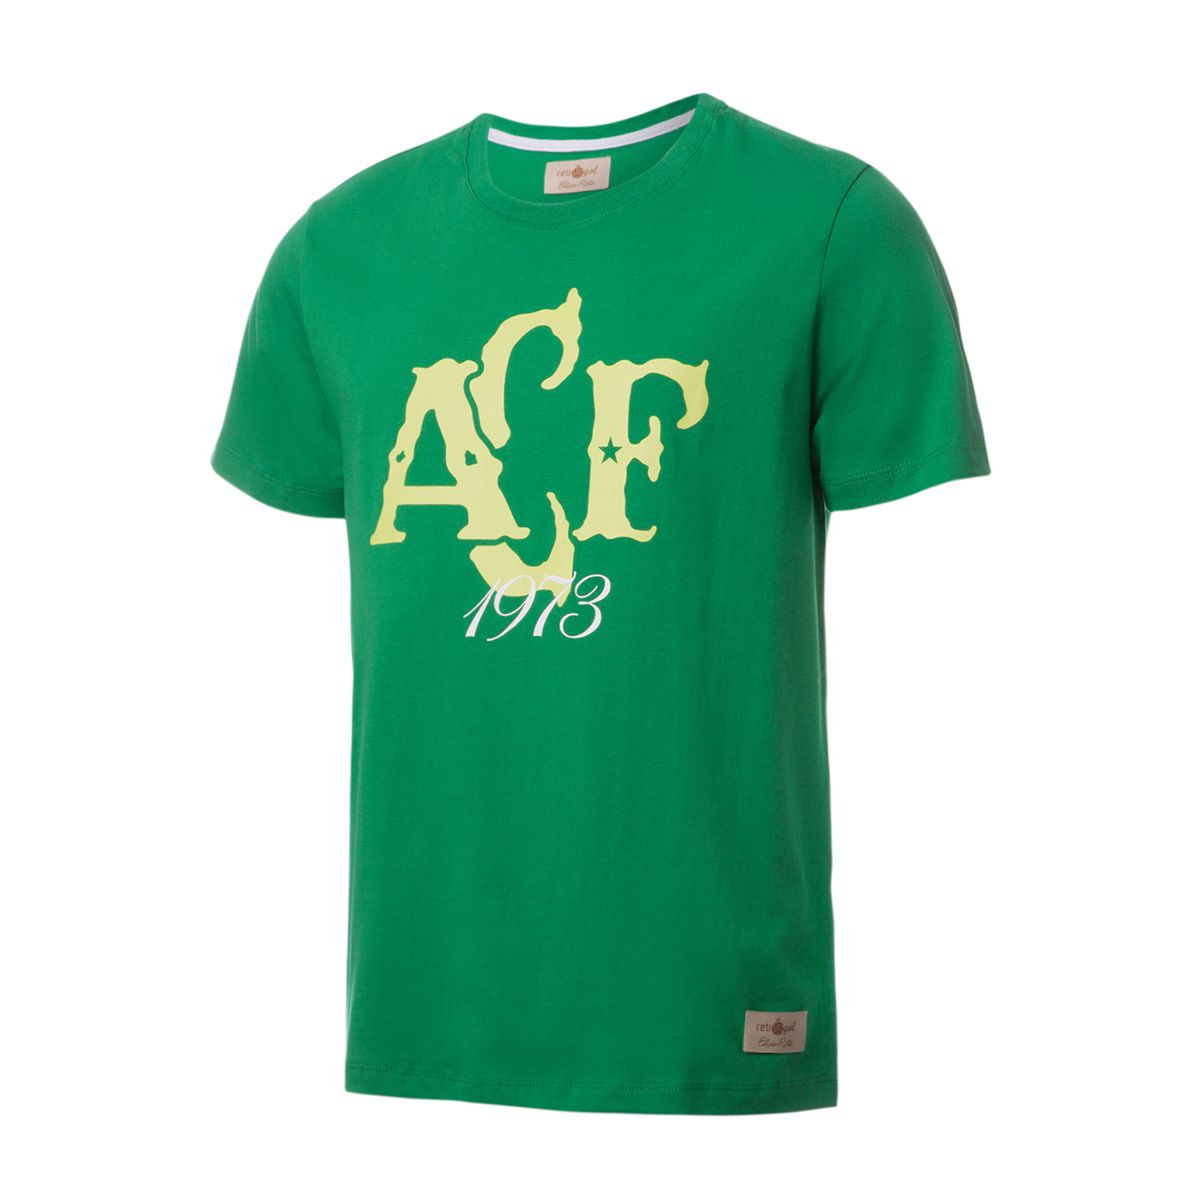 Camisa Casual Retrô Gol Chapecoense Torcedor 1973 Verde